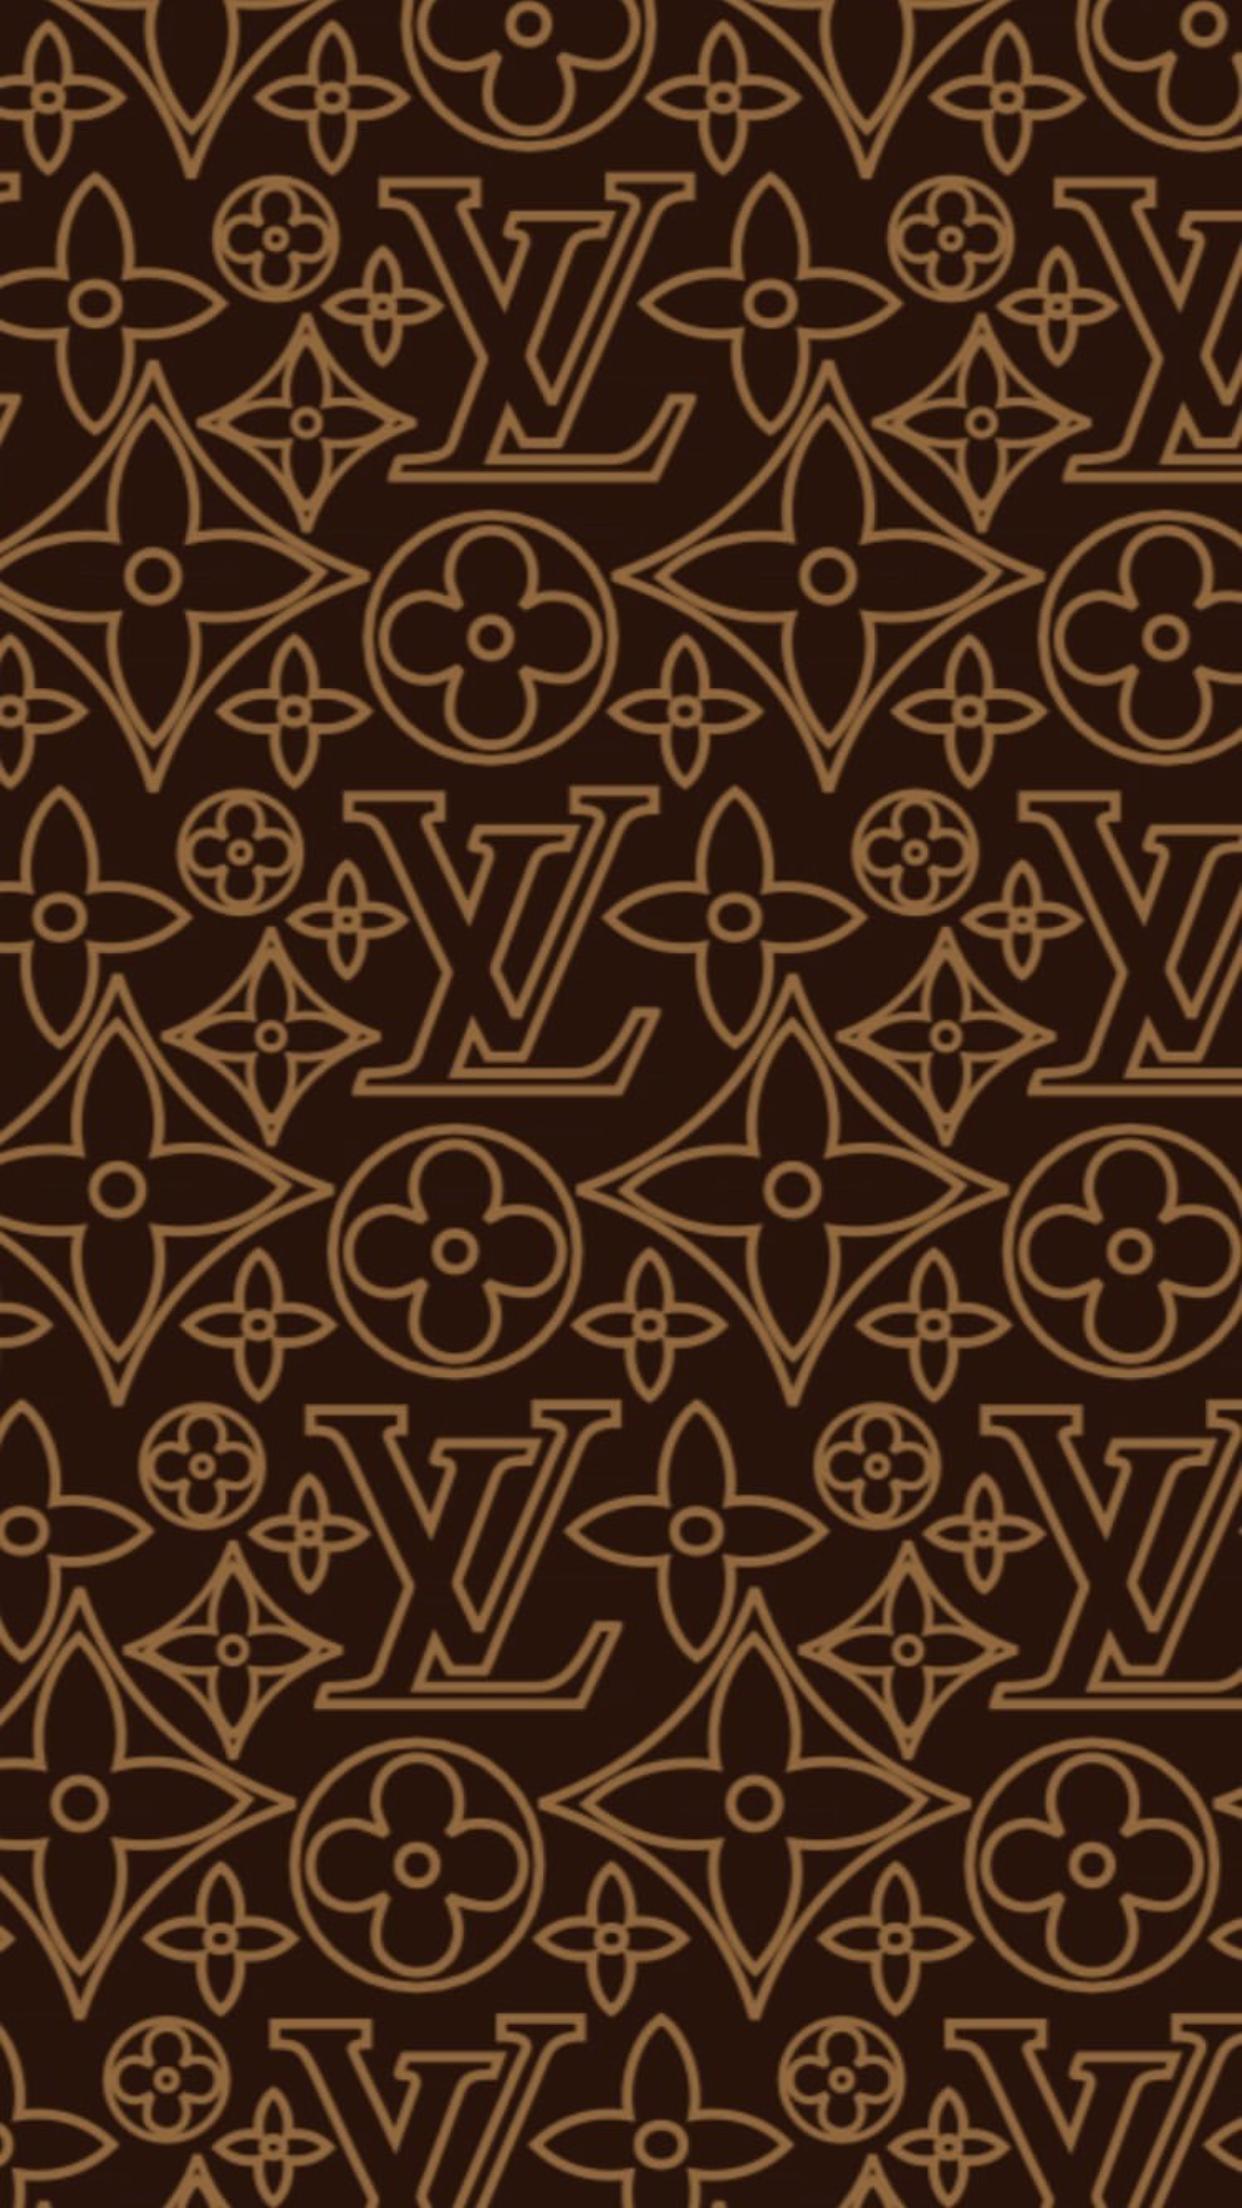 Lv Wallpaper Blackwallpaperiphone Wallpaper Brown Louisvuitton Hypebeast Wallpaper Pretty Wallpaper Iphone Black Wallpaper Iphone